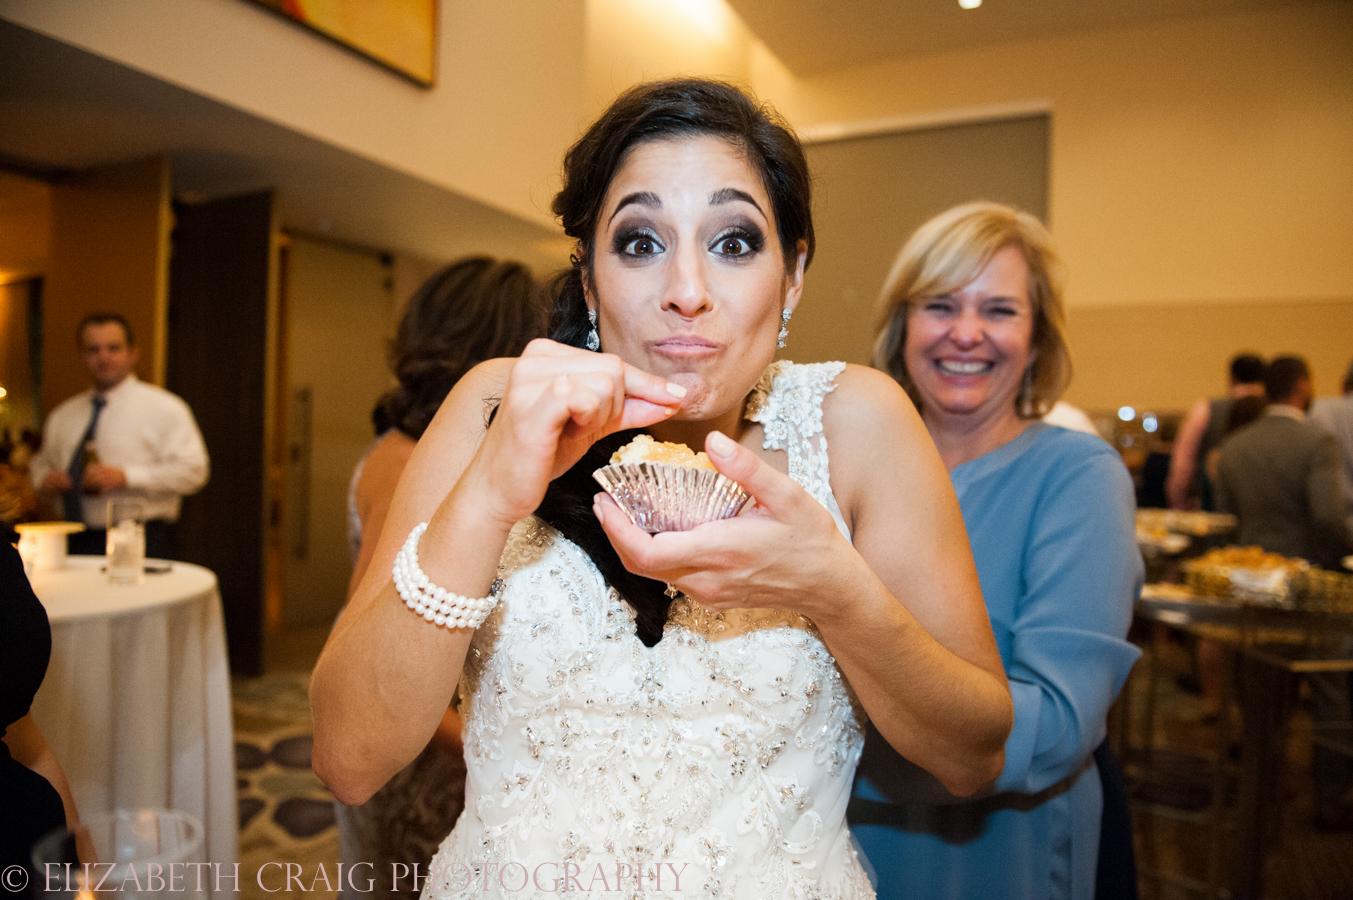 pittsburgh-greek-weddings-fairmont-weddings-receptions-elizabeth-craig-photohgraphy-031